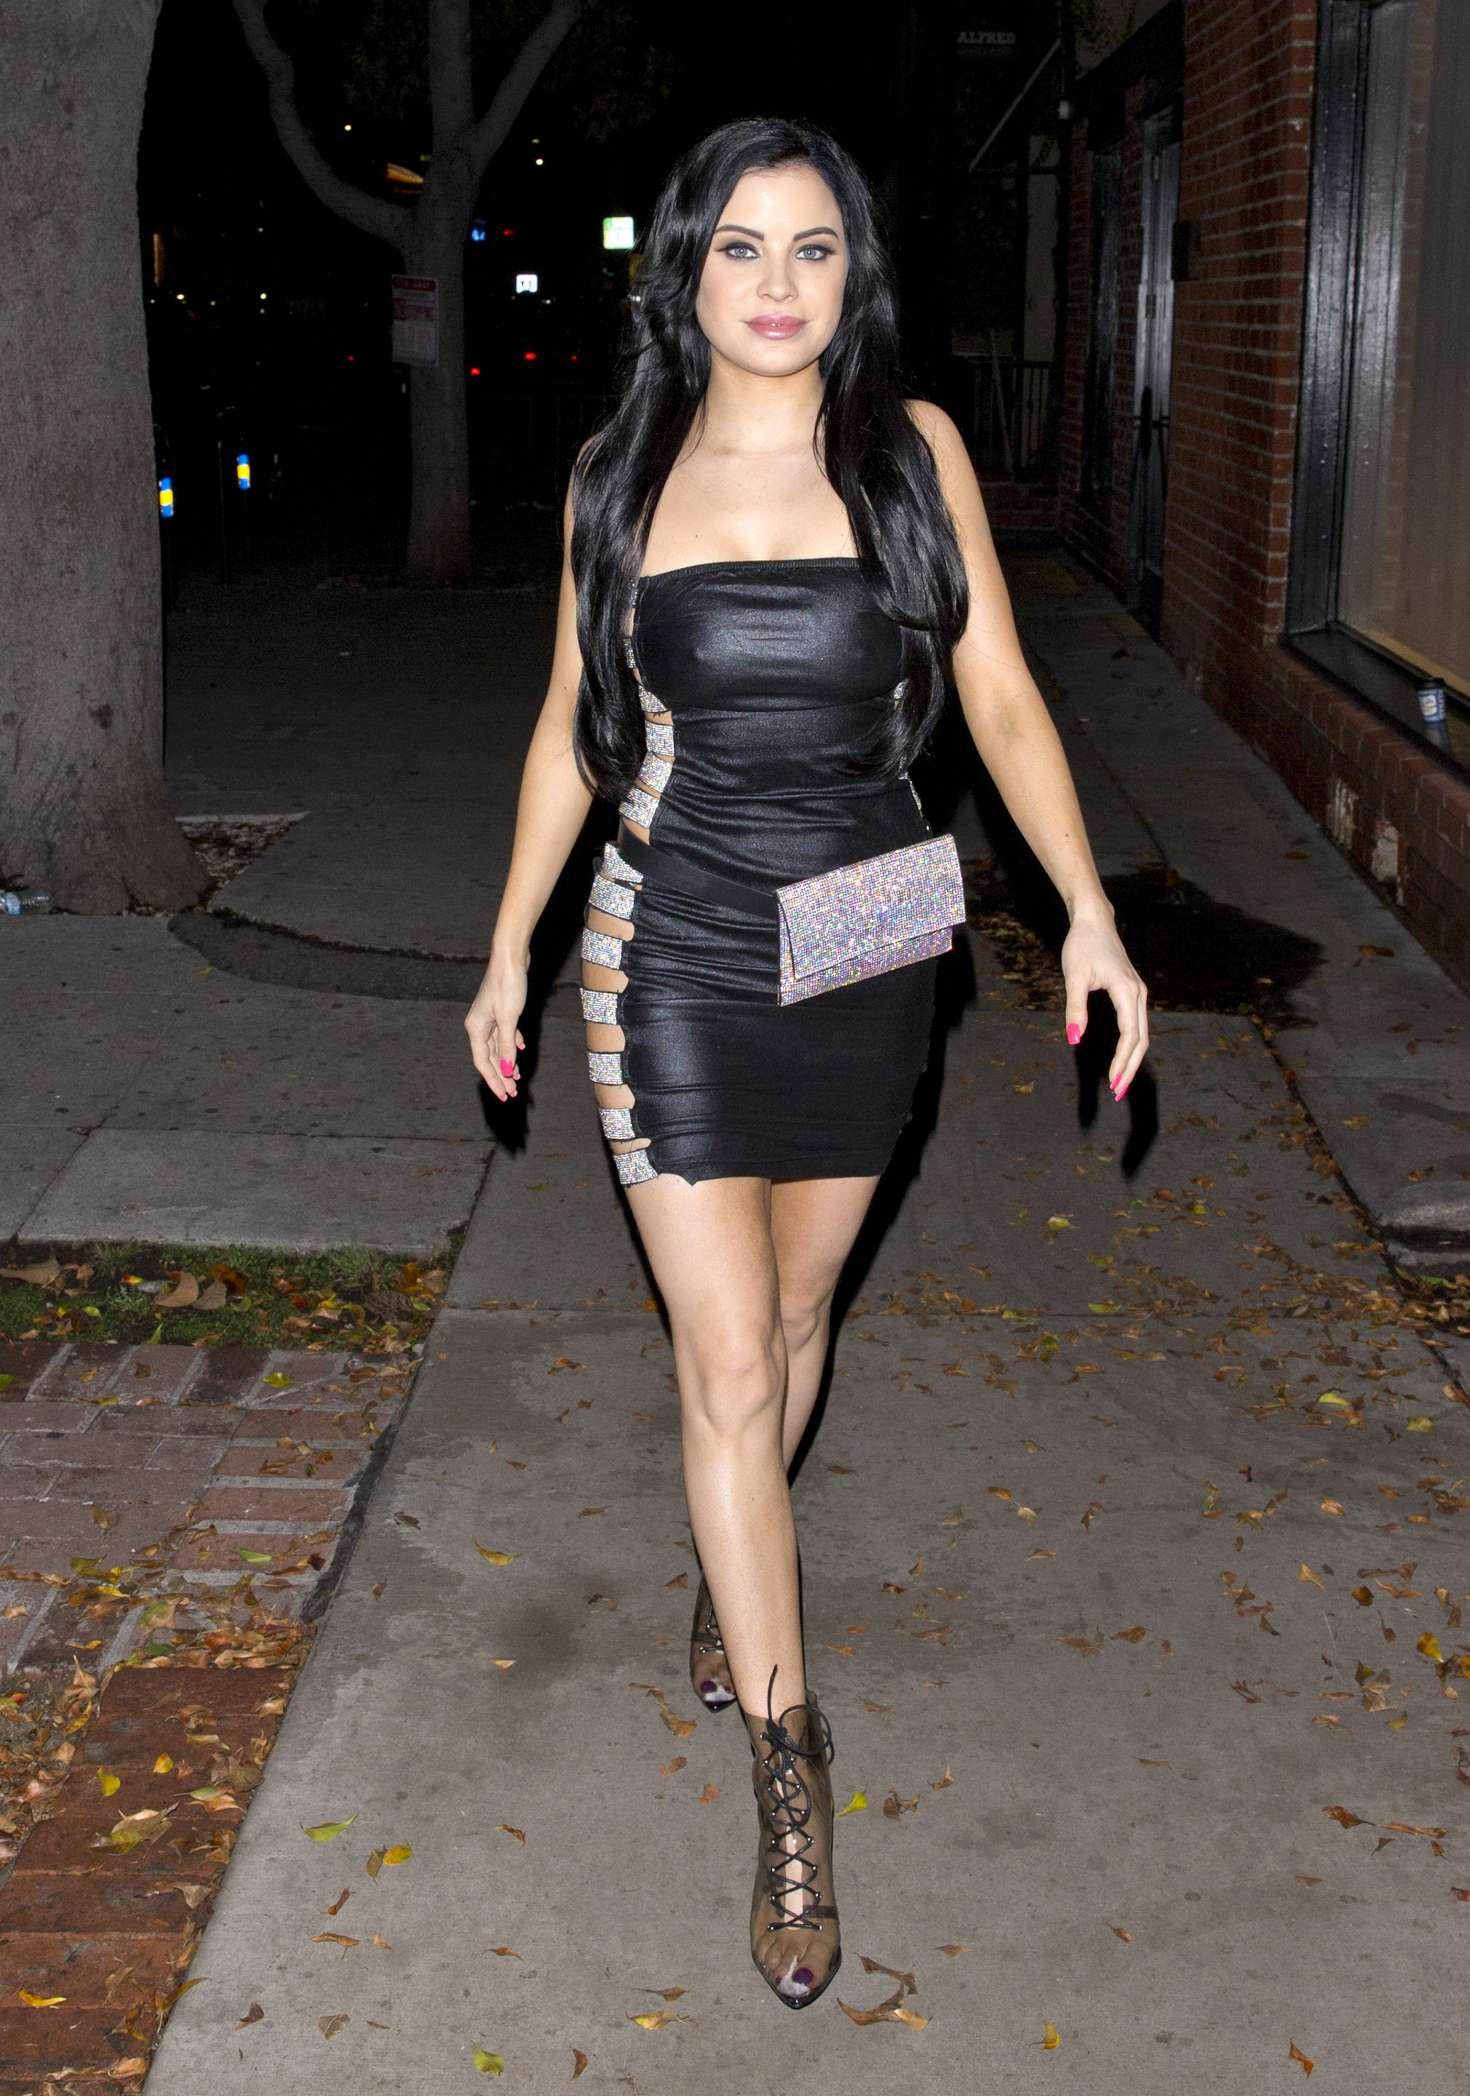 Watch Carla howe in mini dress atomic blonde film event at village underground in london video